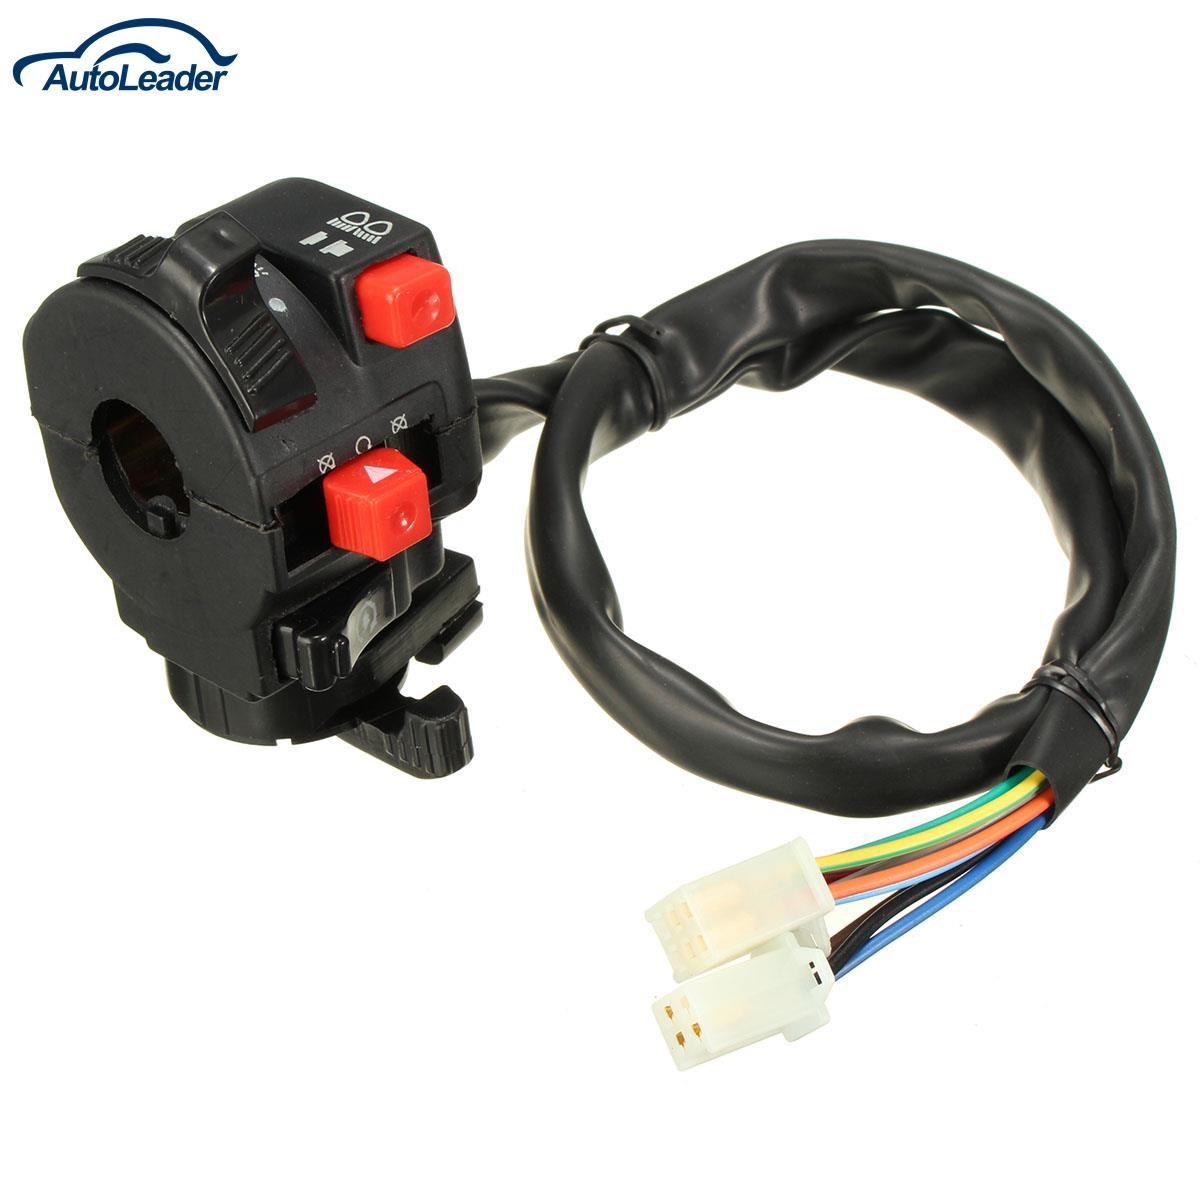 Freeshipping Left Control Switch For Most Chinese ATV Mini Quad Headlight Throttle Bean Light